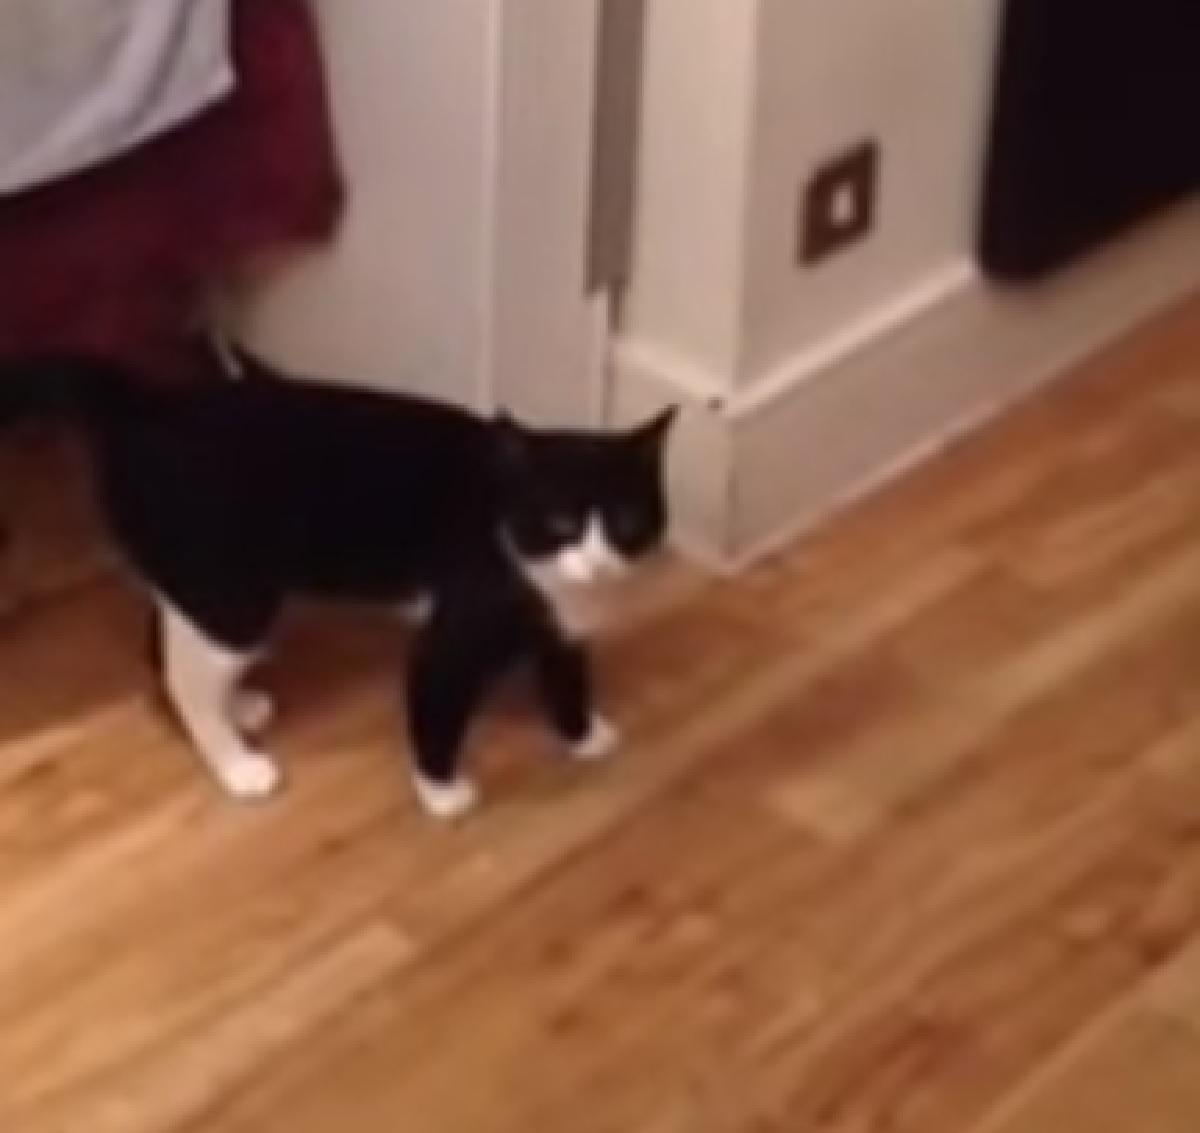 gattino si aggira cucina senza motivo